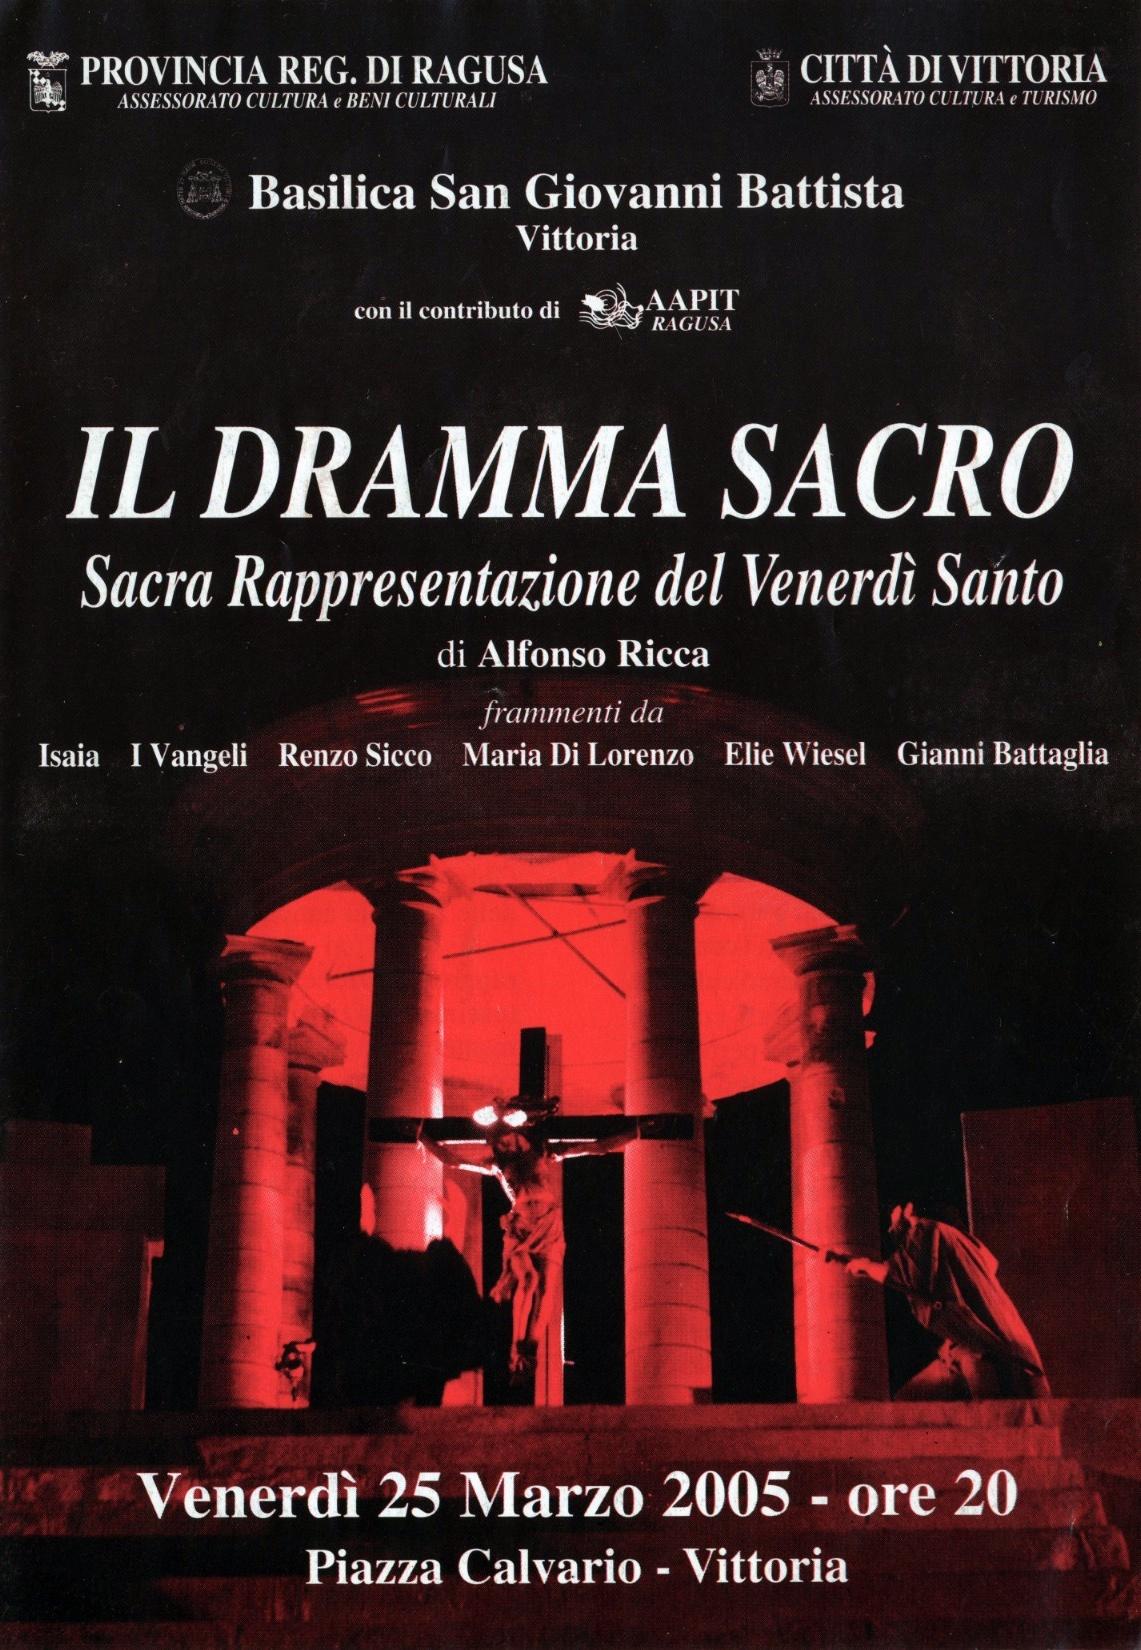 Dramma-sacro-Ed.1-LOCANDINA